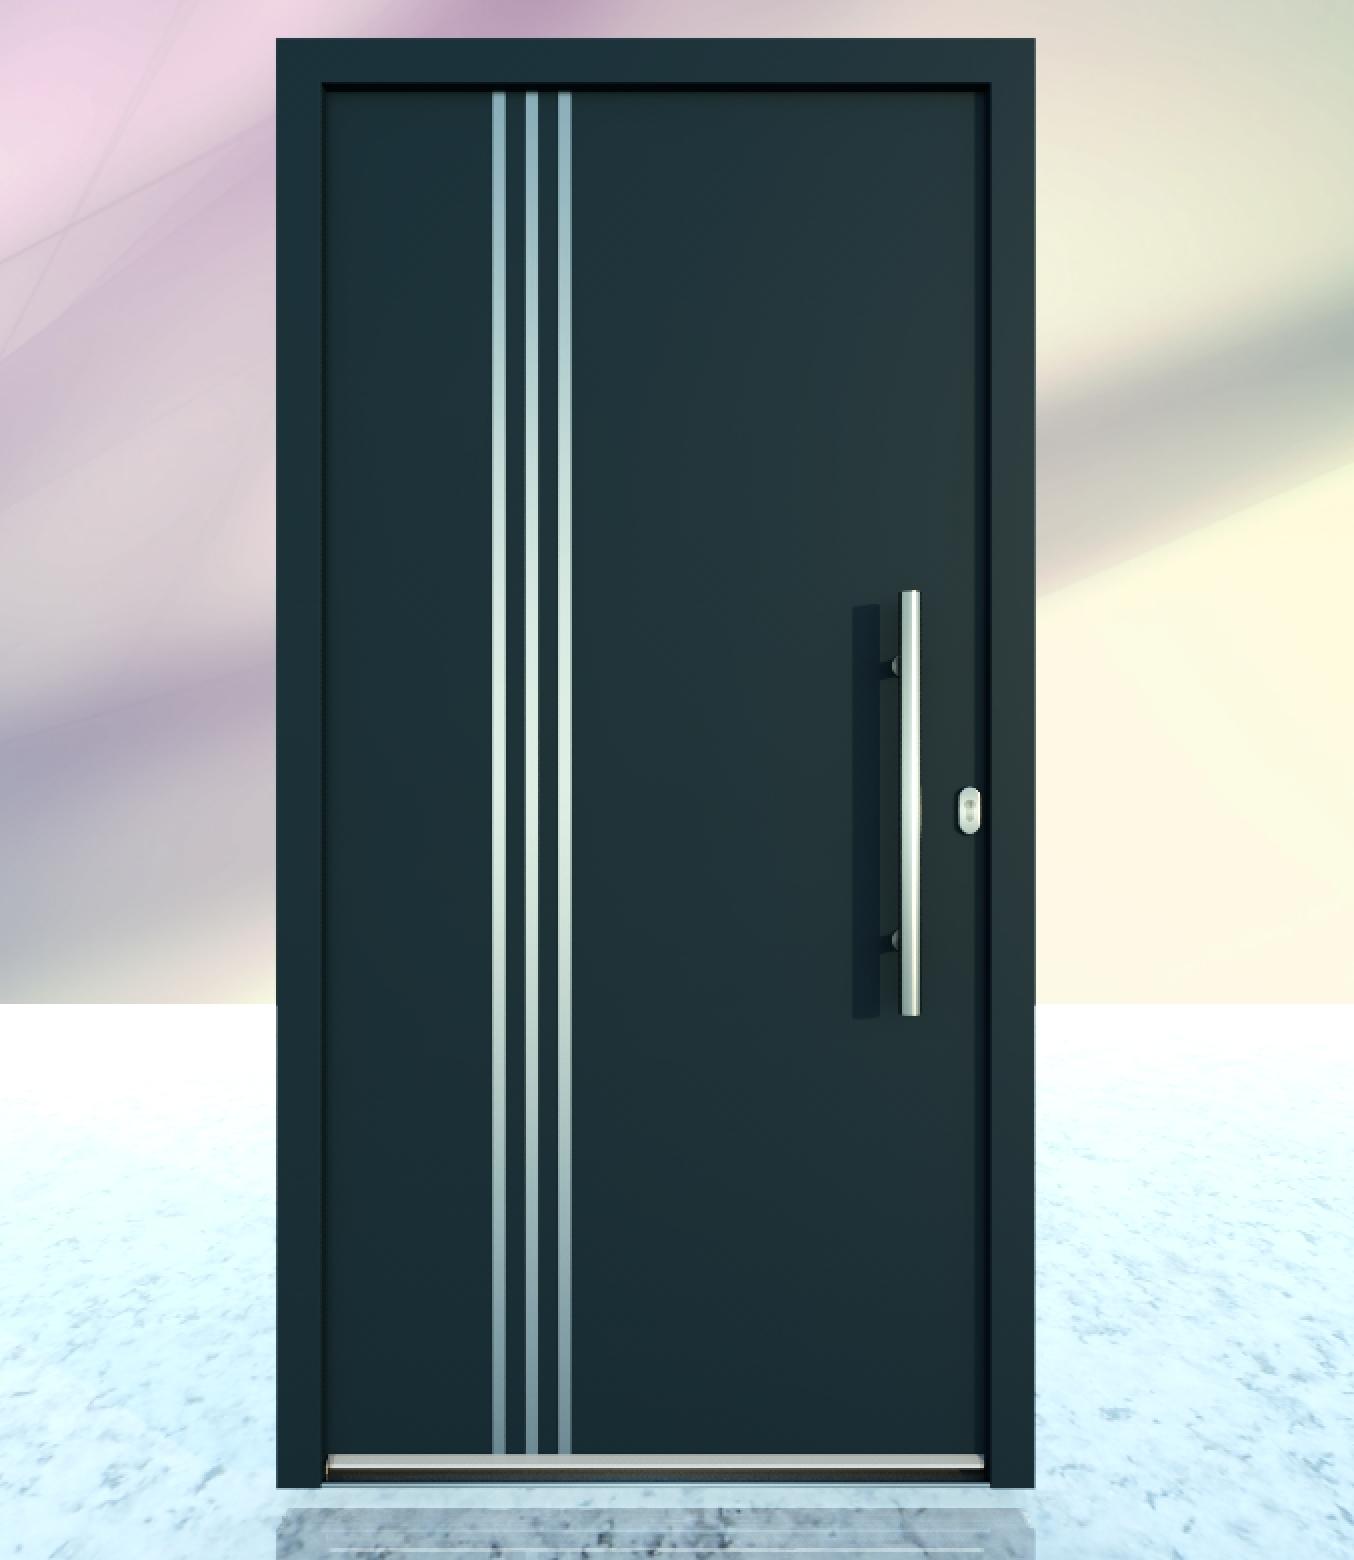 welthaus haust r la10 wh75 aluminium mit kunststoff auf lager 10 welthaus t ren shop welthaus. Black Bedroom Furniture Sets. Home Design Ideas